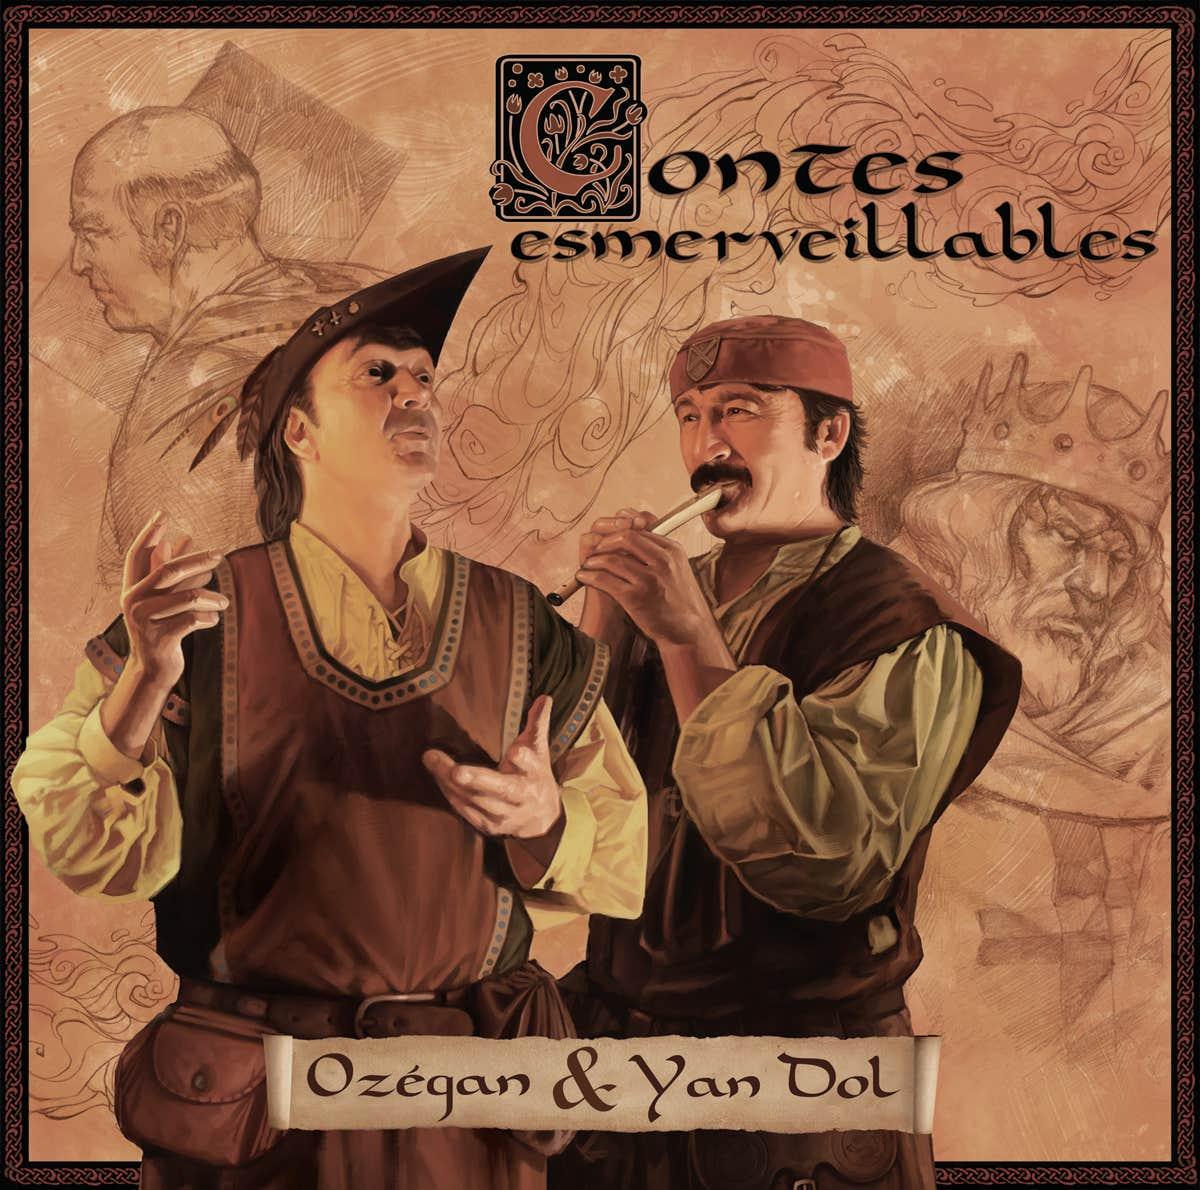 Contes Esmerveillables (commission - CD front cover)